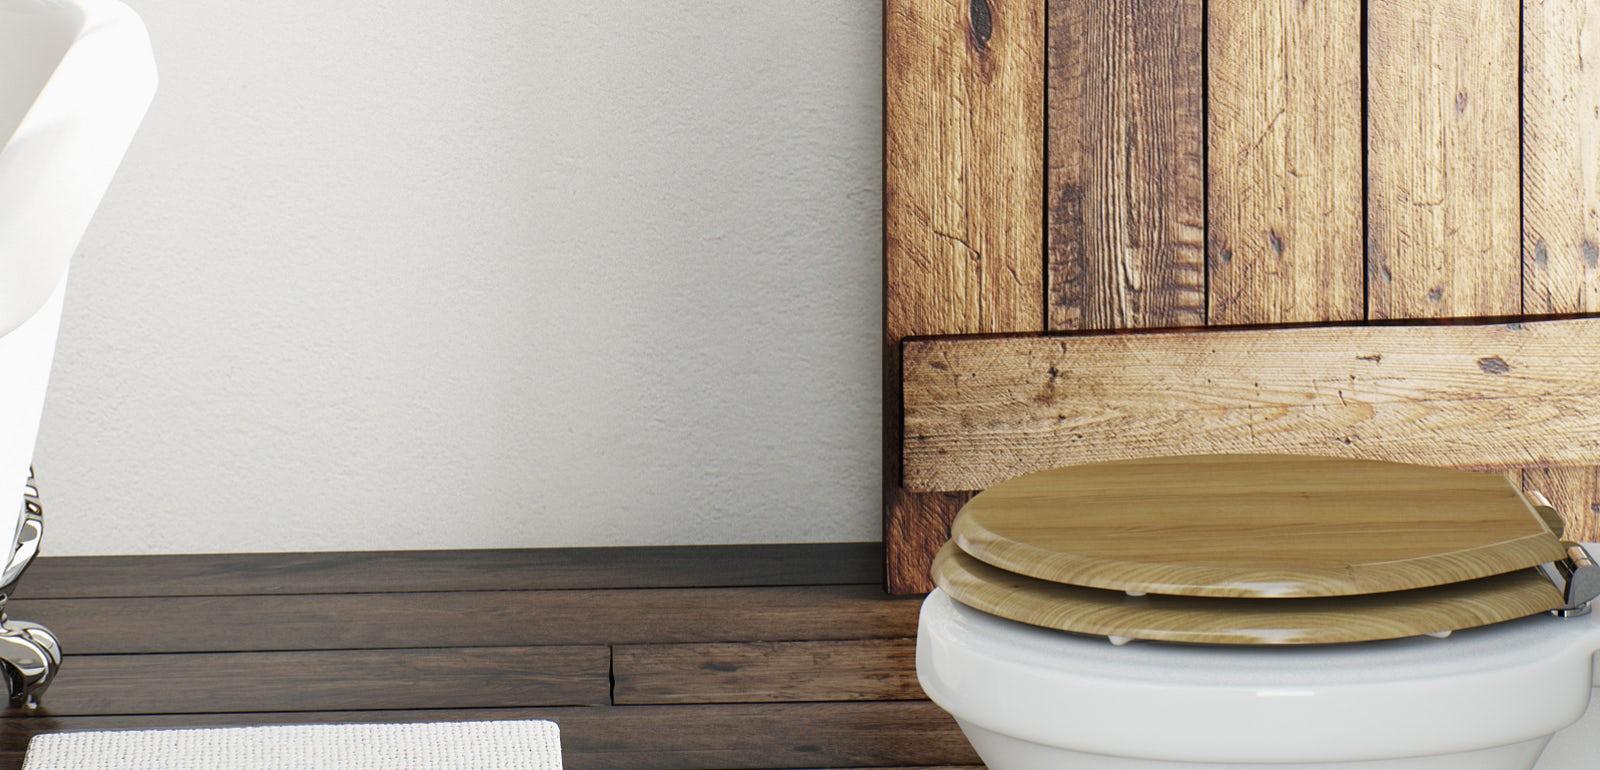 Toilet Comforts Plastic Or Wood